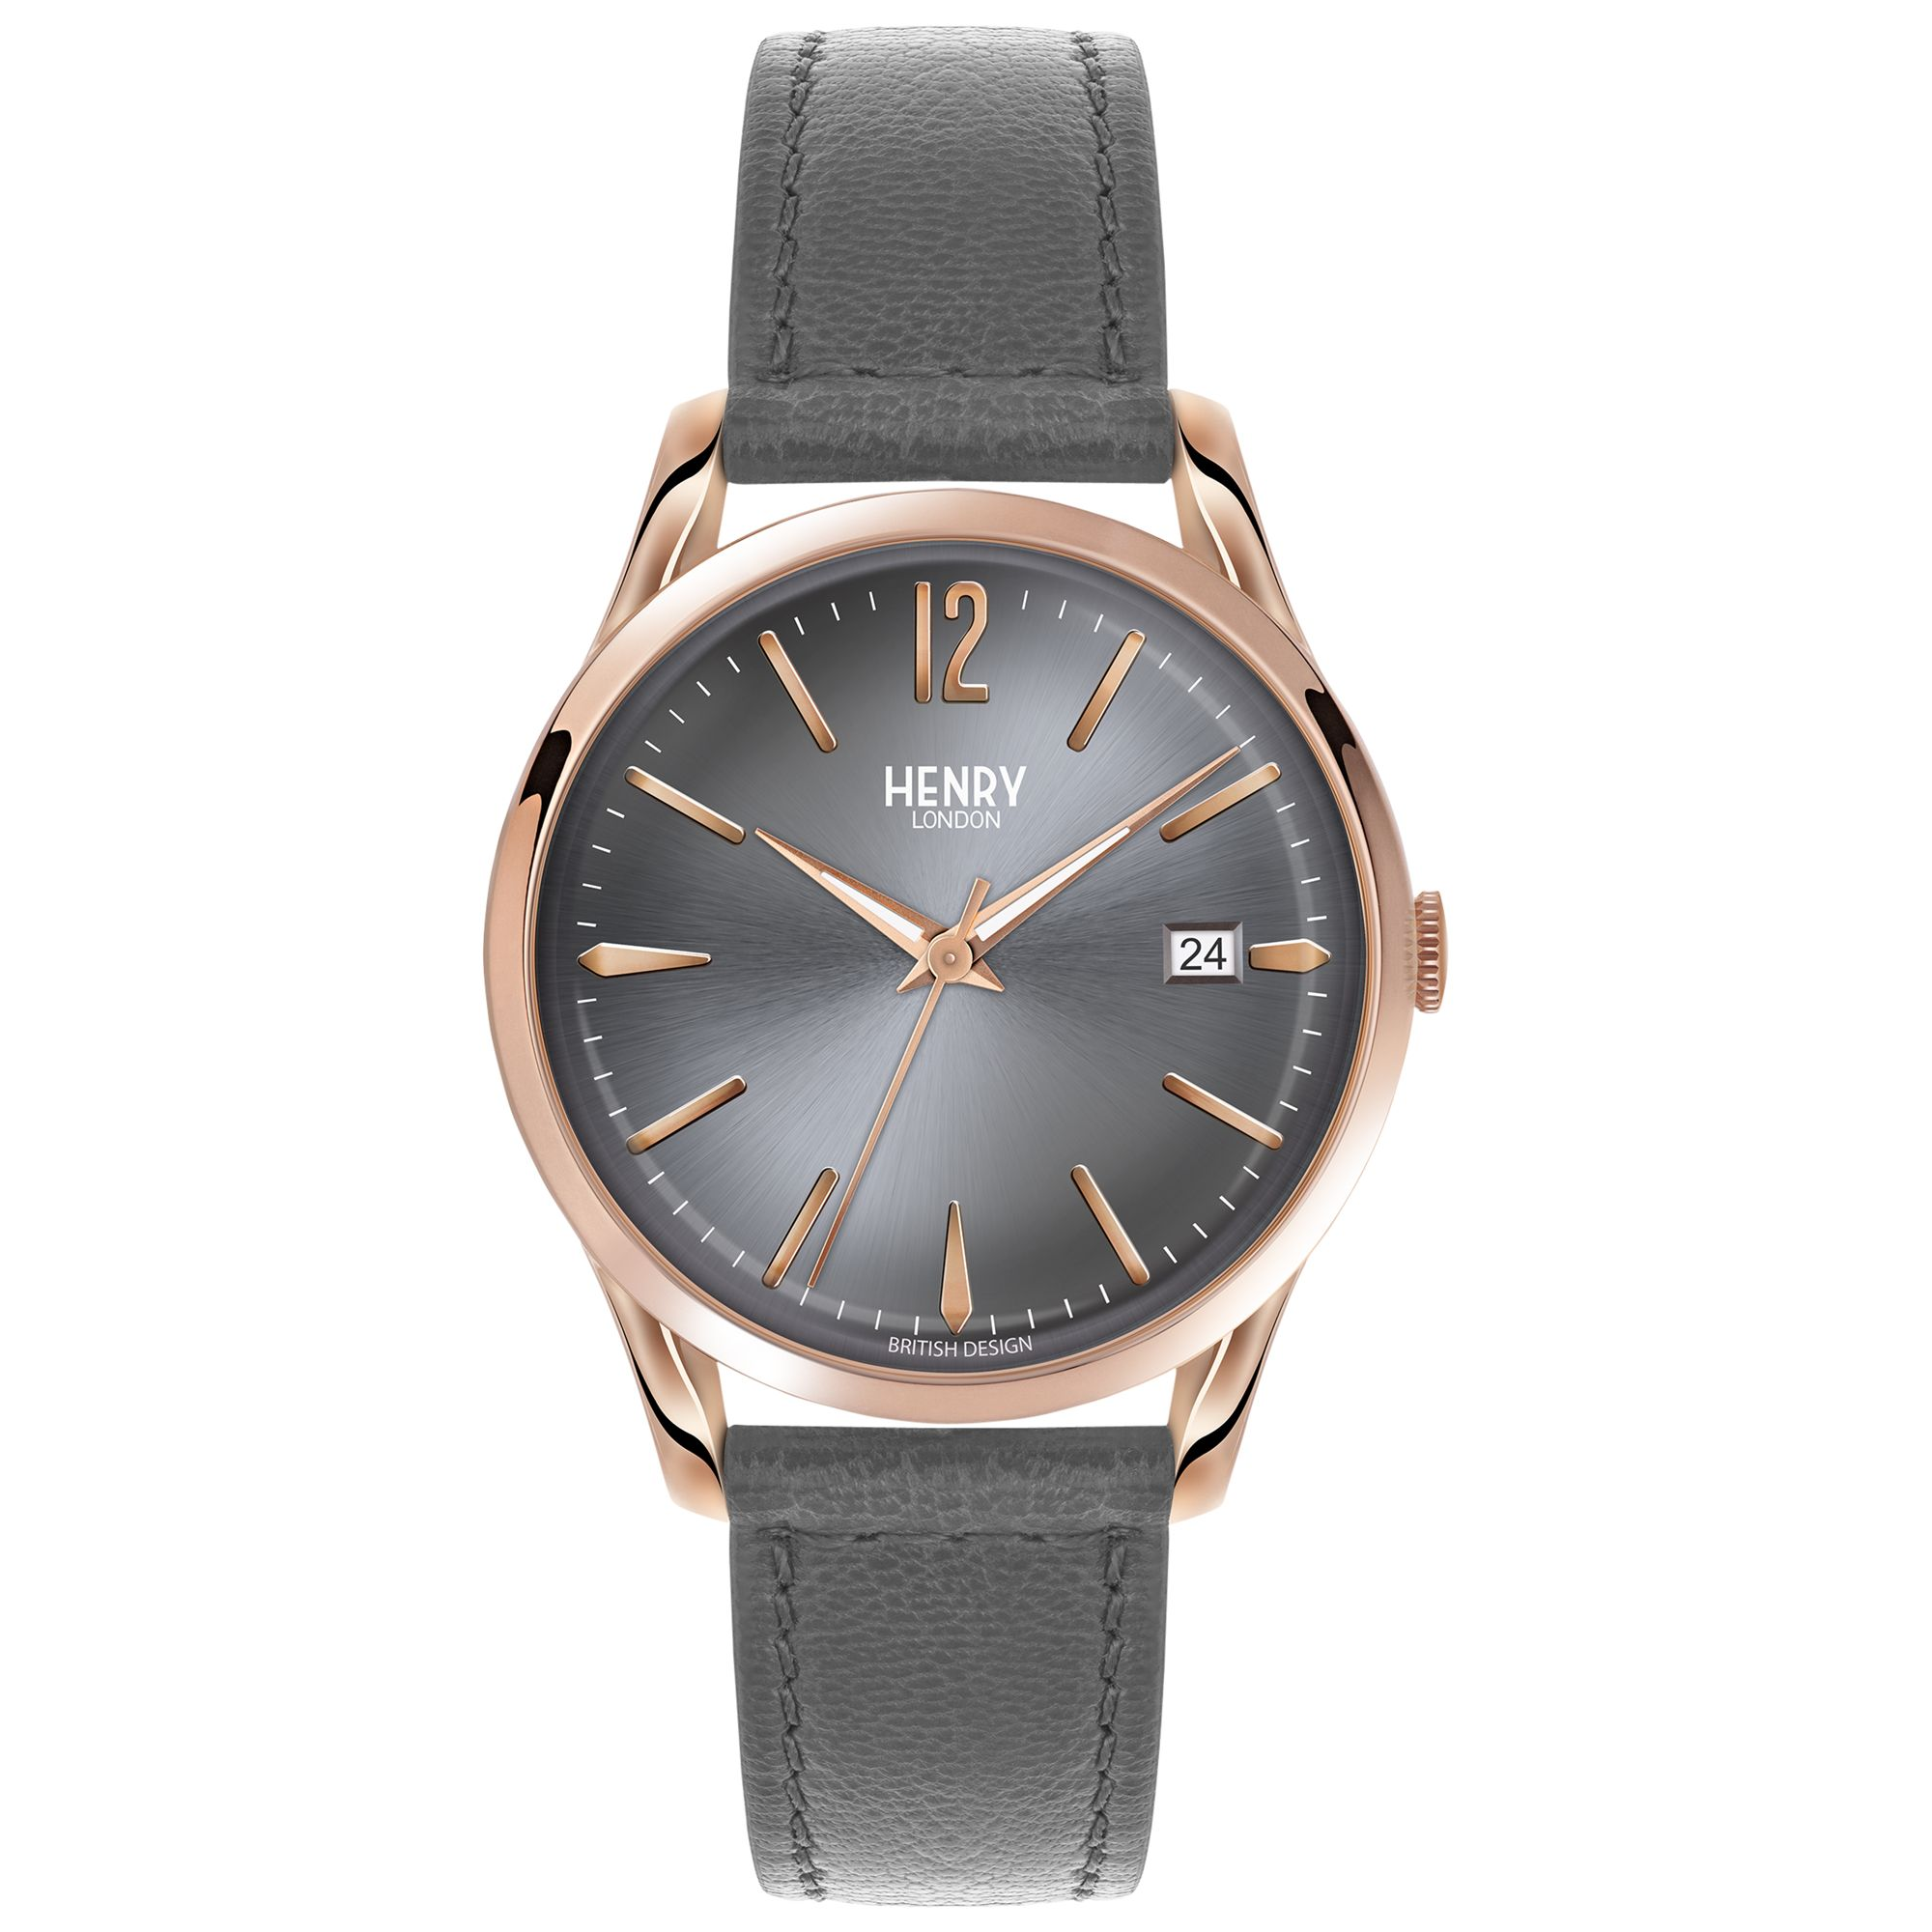 Henry London Henry London HL39-S-0120 Women's Finchley Date Leather Strap Watch, Grey